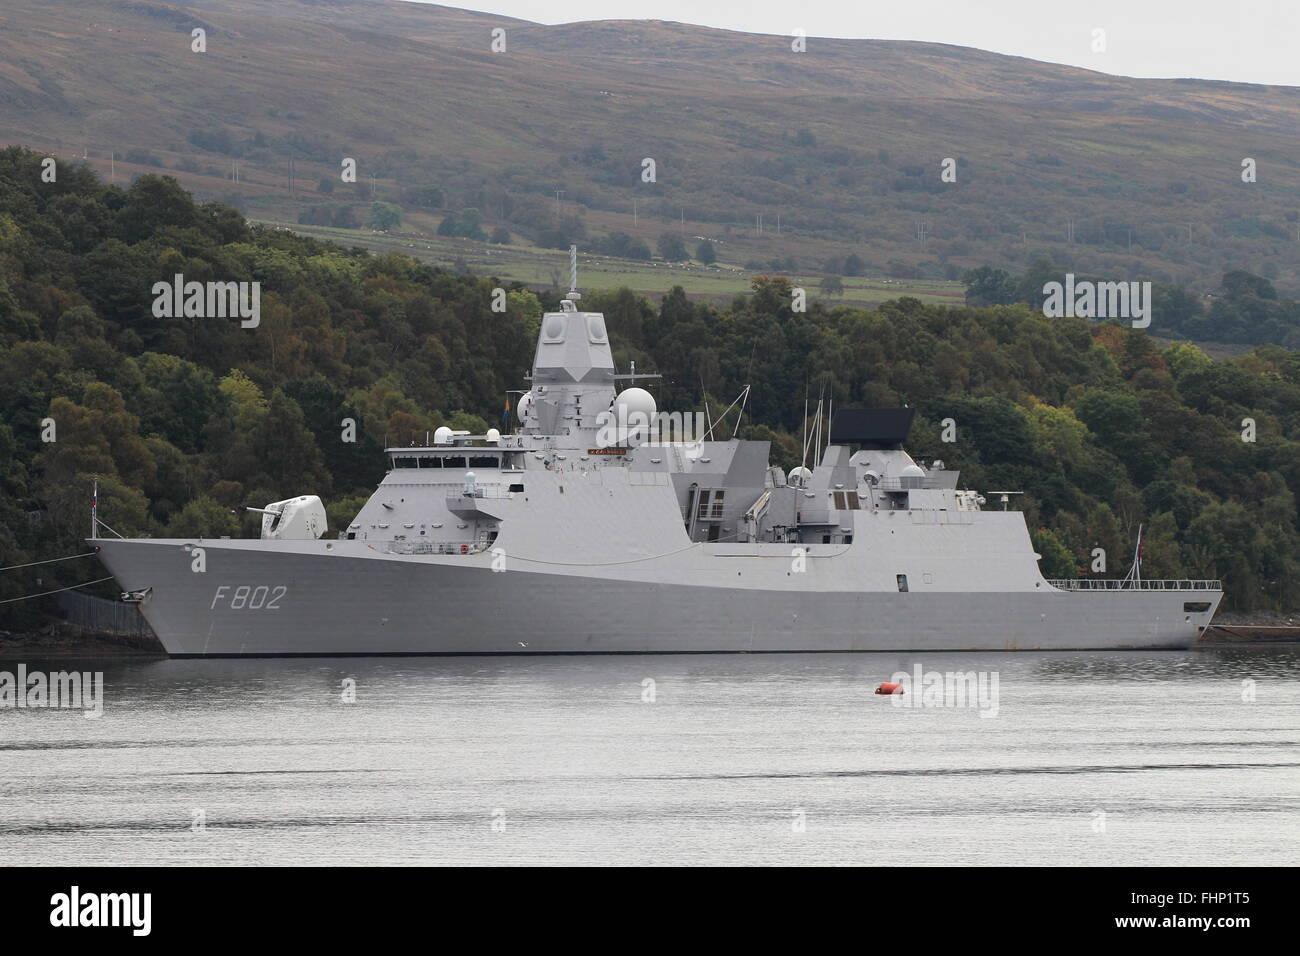 HNLMS De Zeven Provincien (F802), of the Royal Netherlands Navy, berthed at Faslane before Exercise Joint Warrior - Stock Image